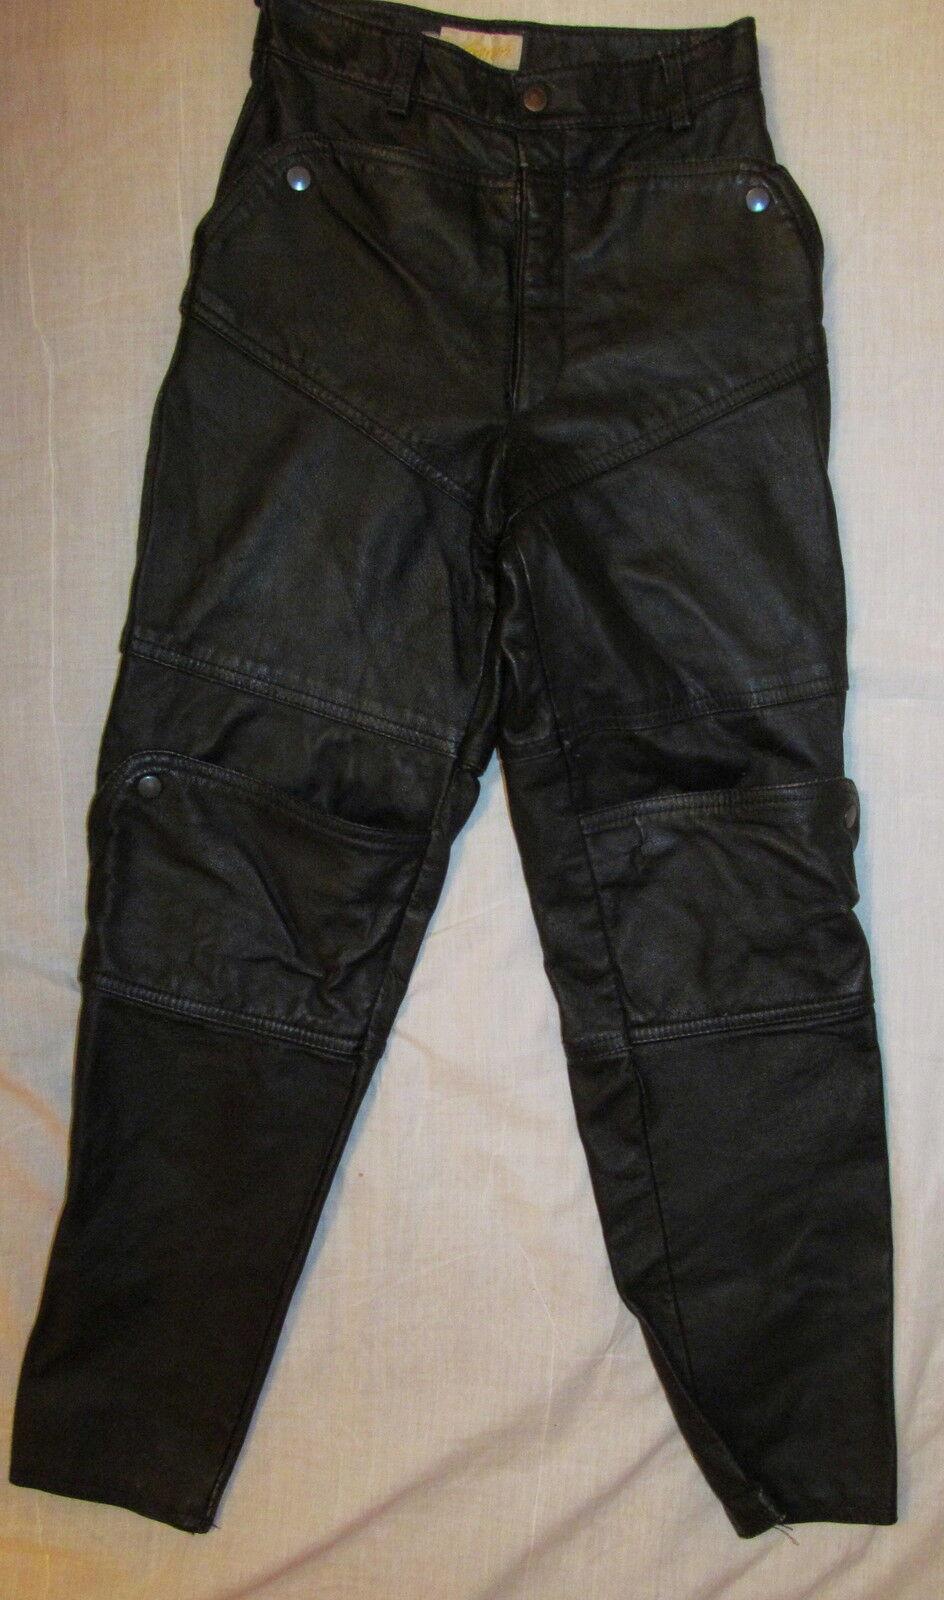 Vintage 80's EXPRESS punk new wave high waist racing biker leather pants 25